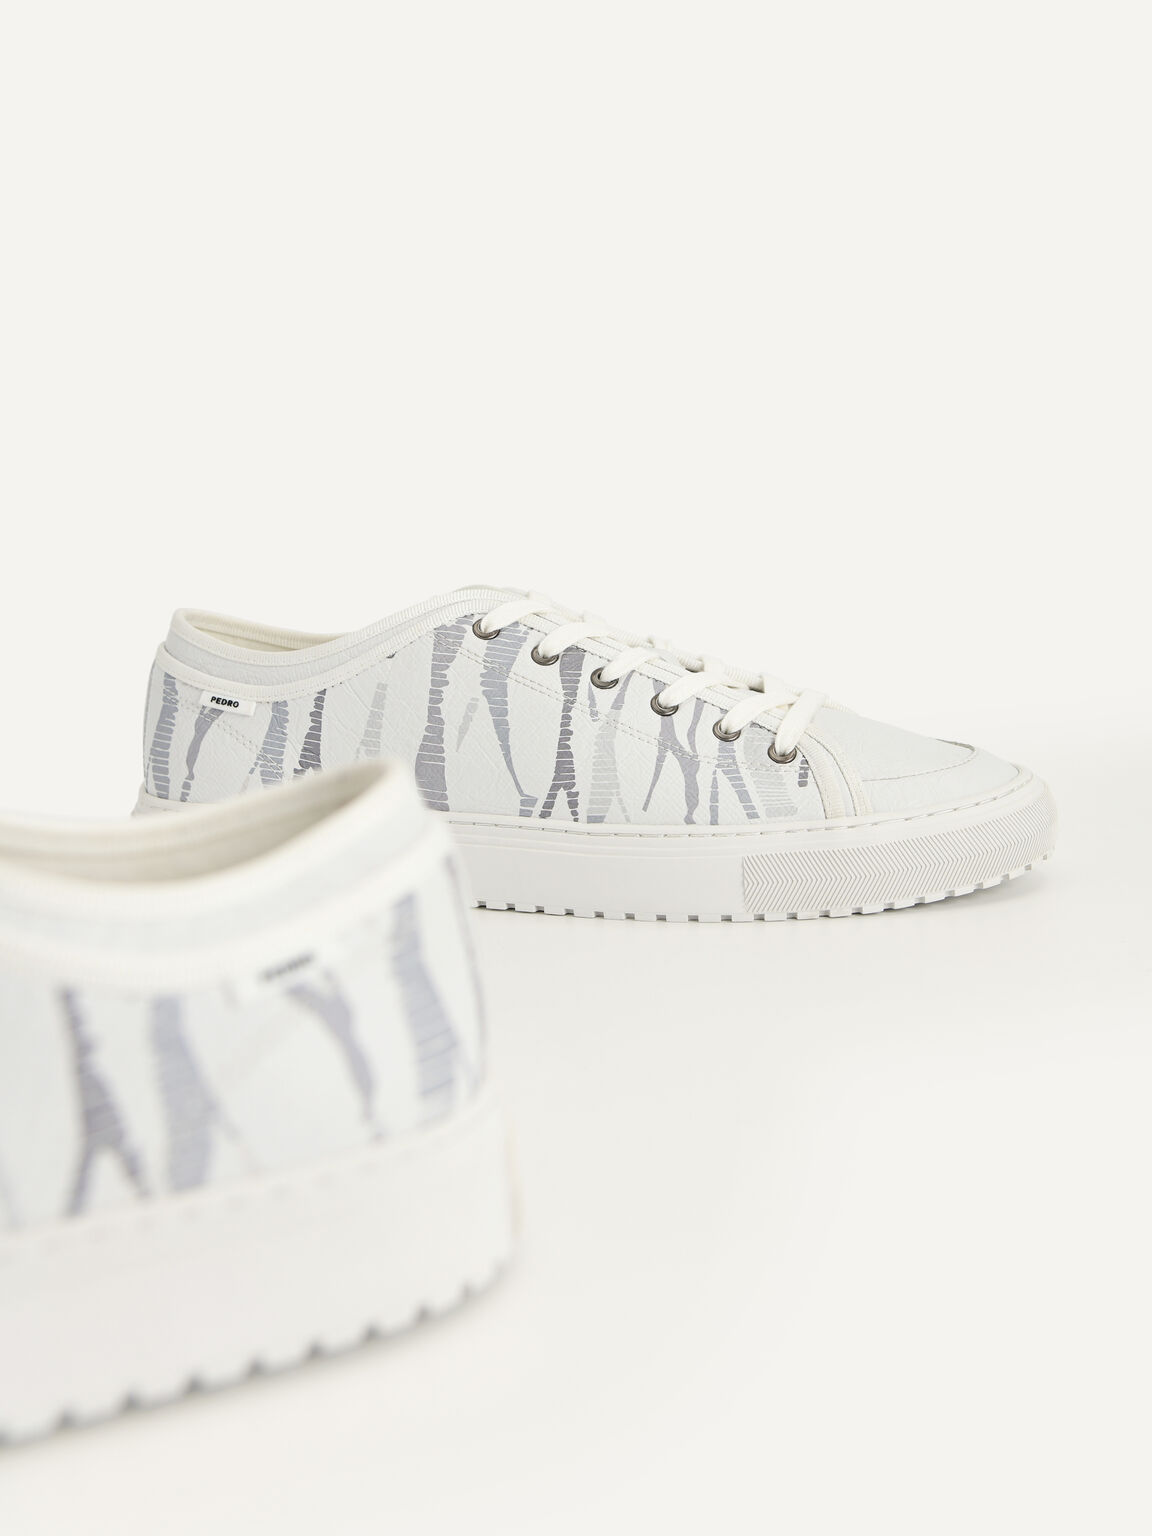 Printed Atlas Sneakers, White, hi-res